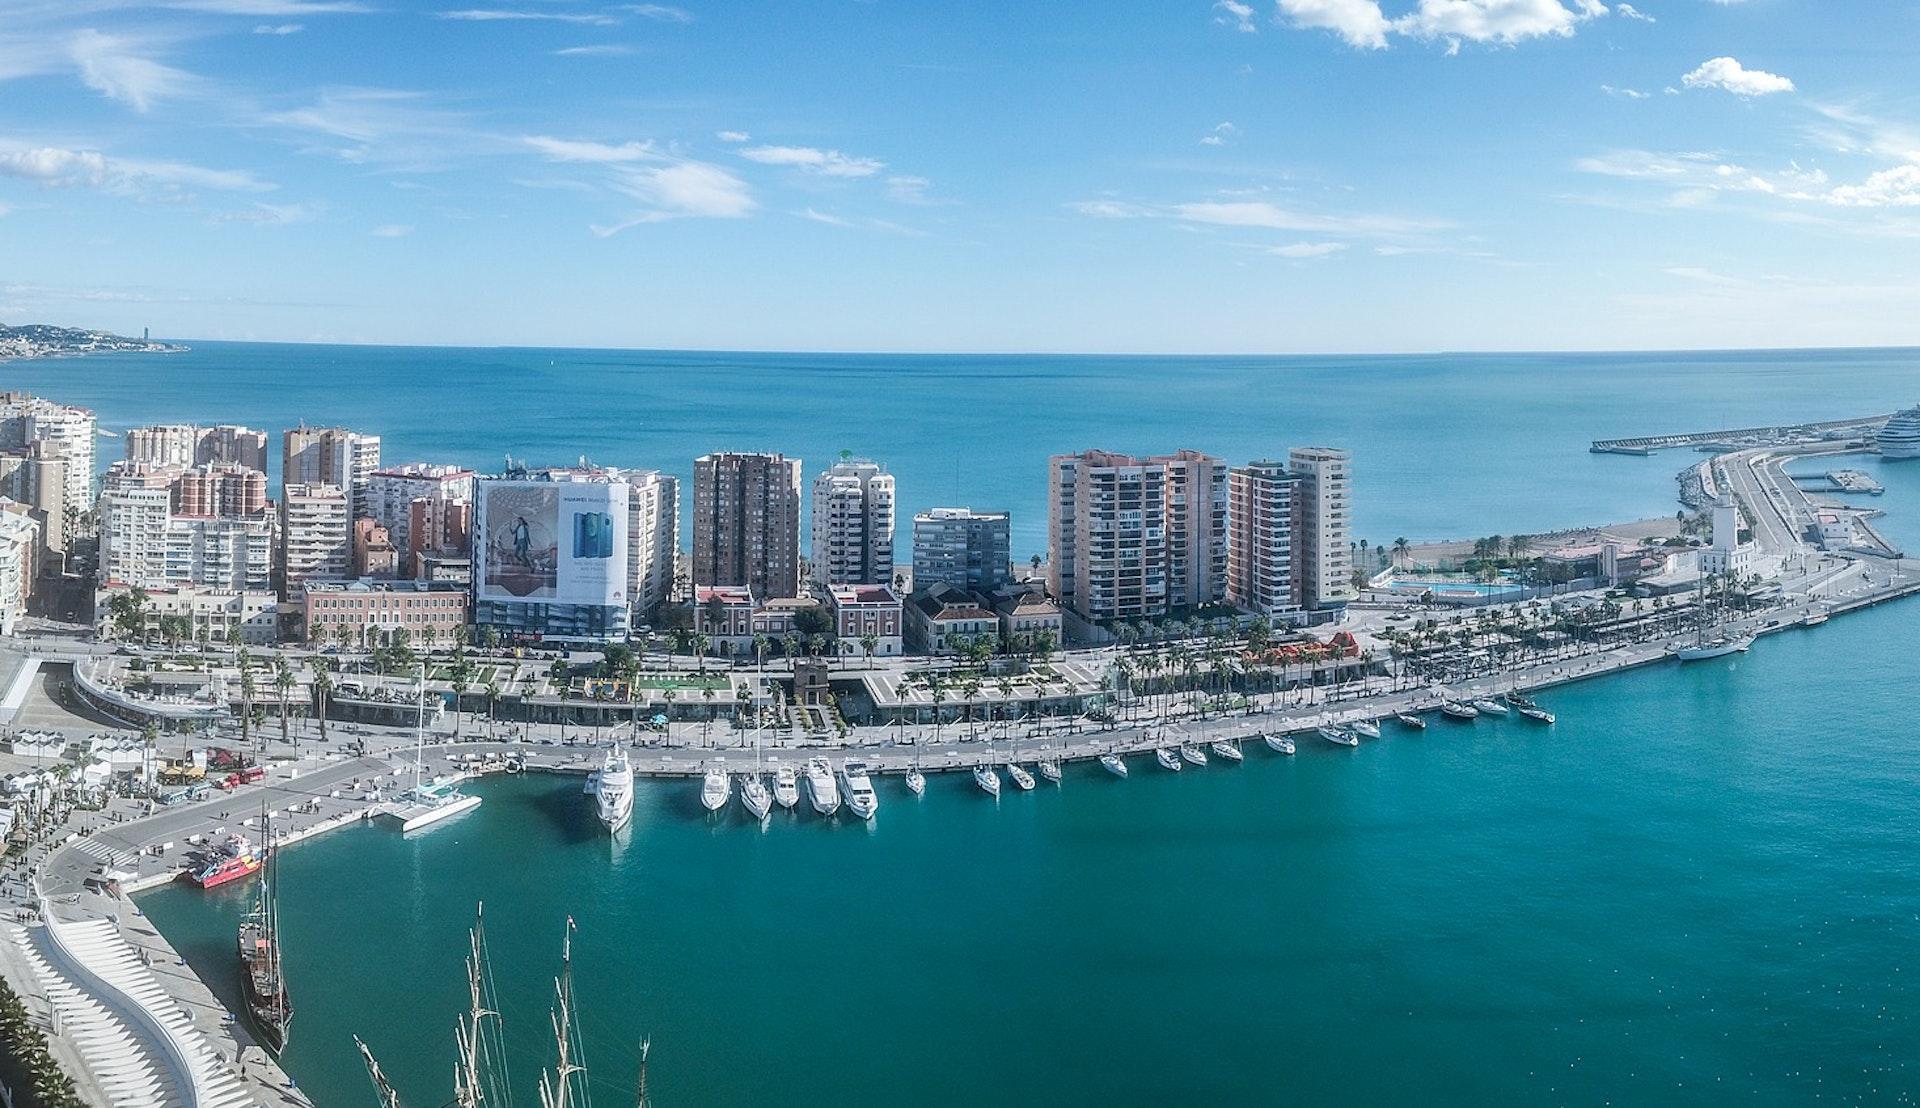 Havnen i Malaga © Manolo Franco, PIxabay